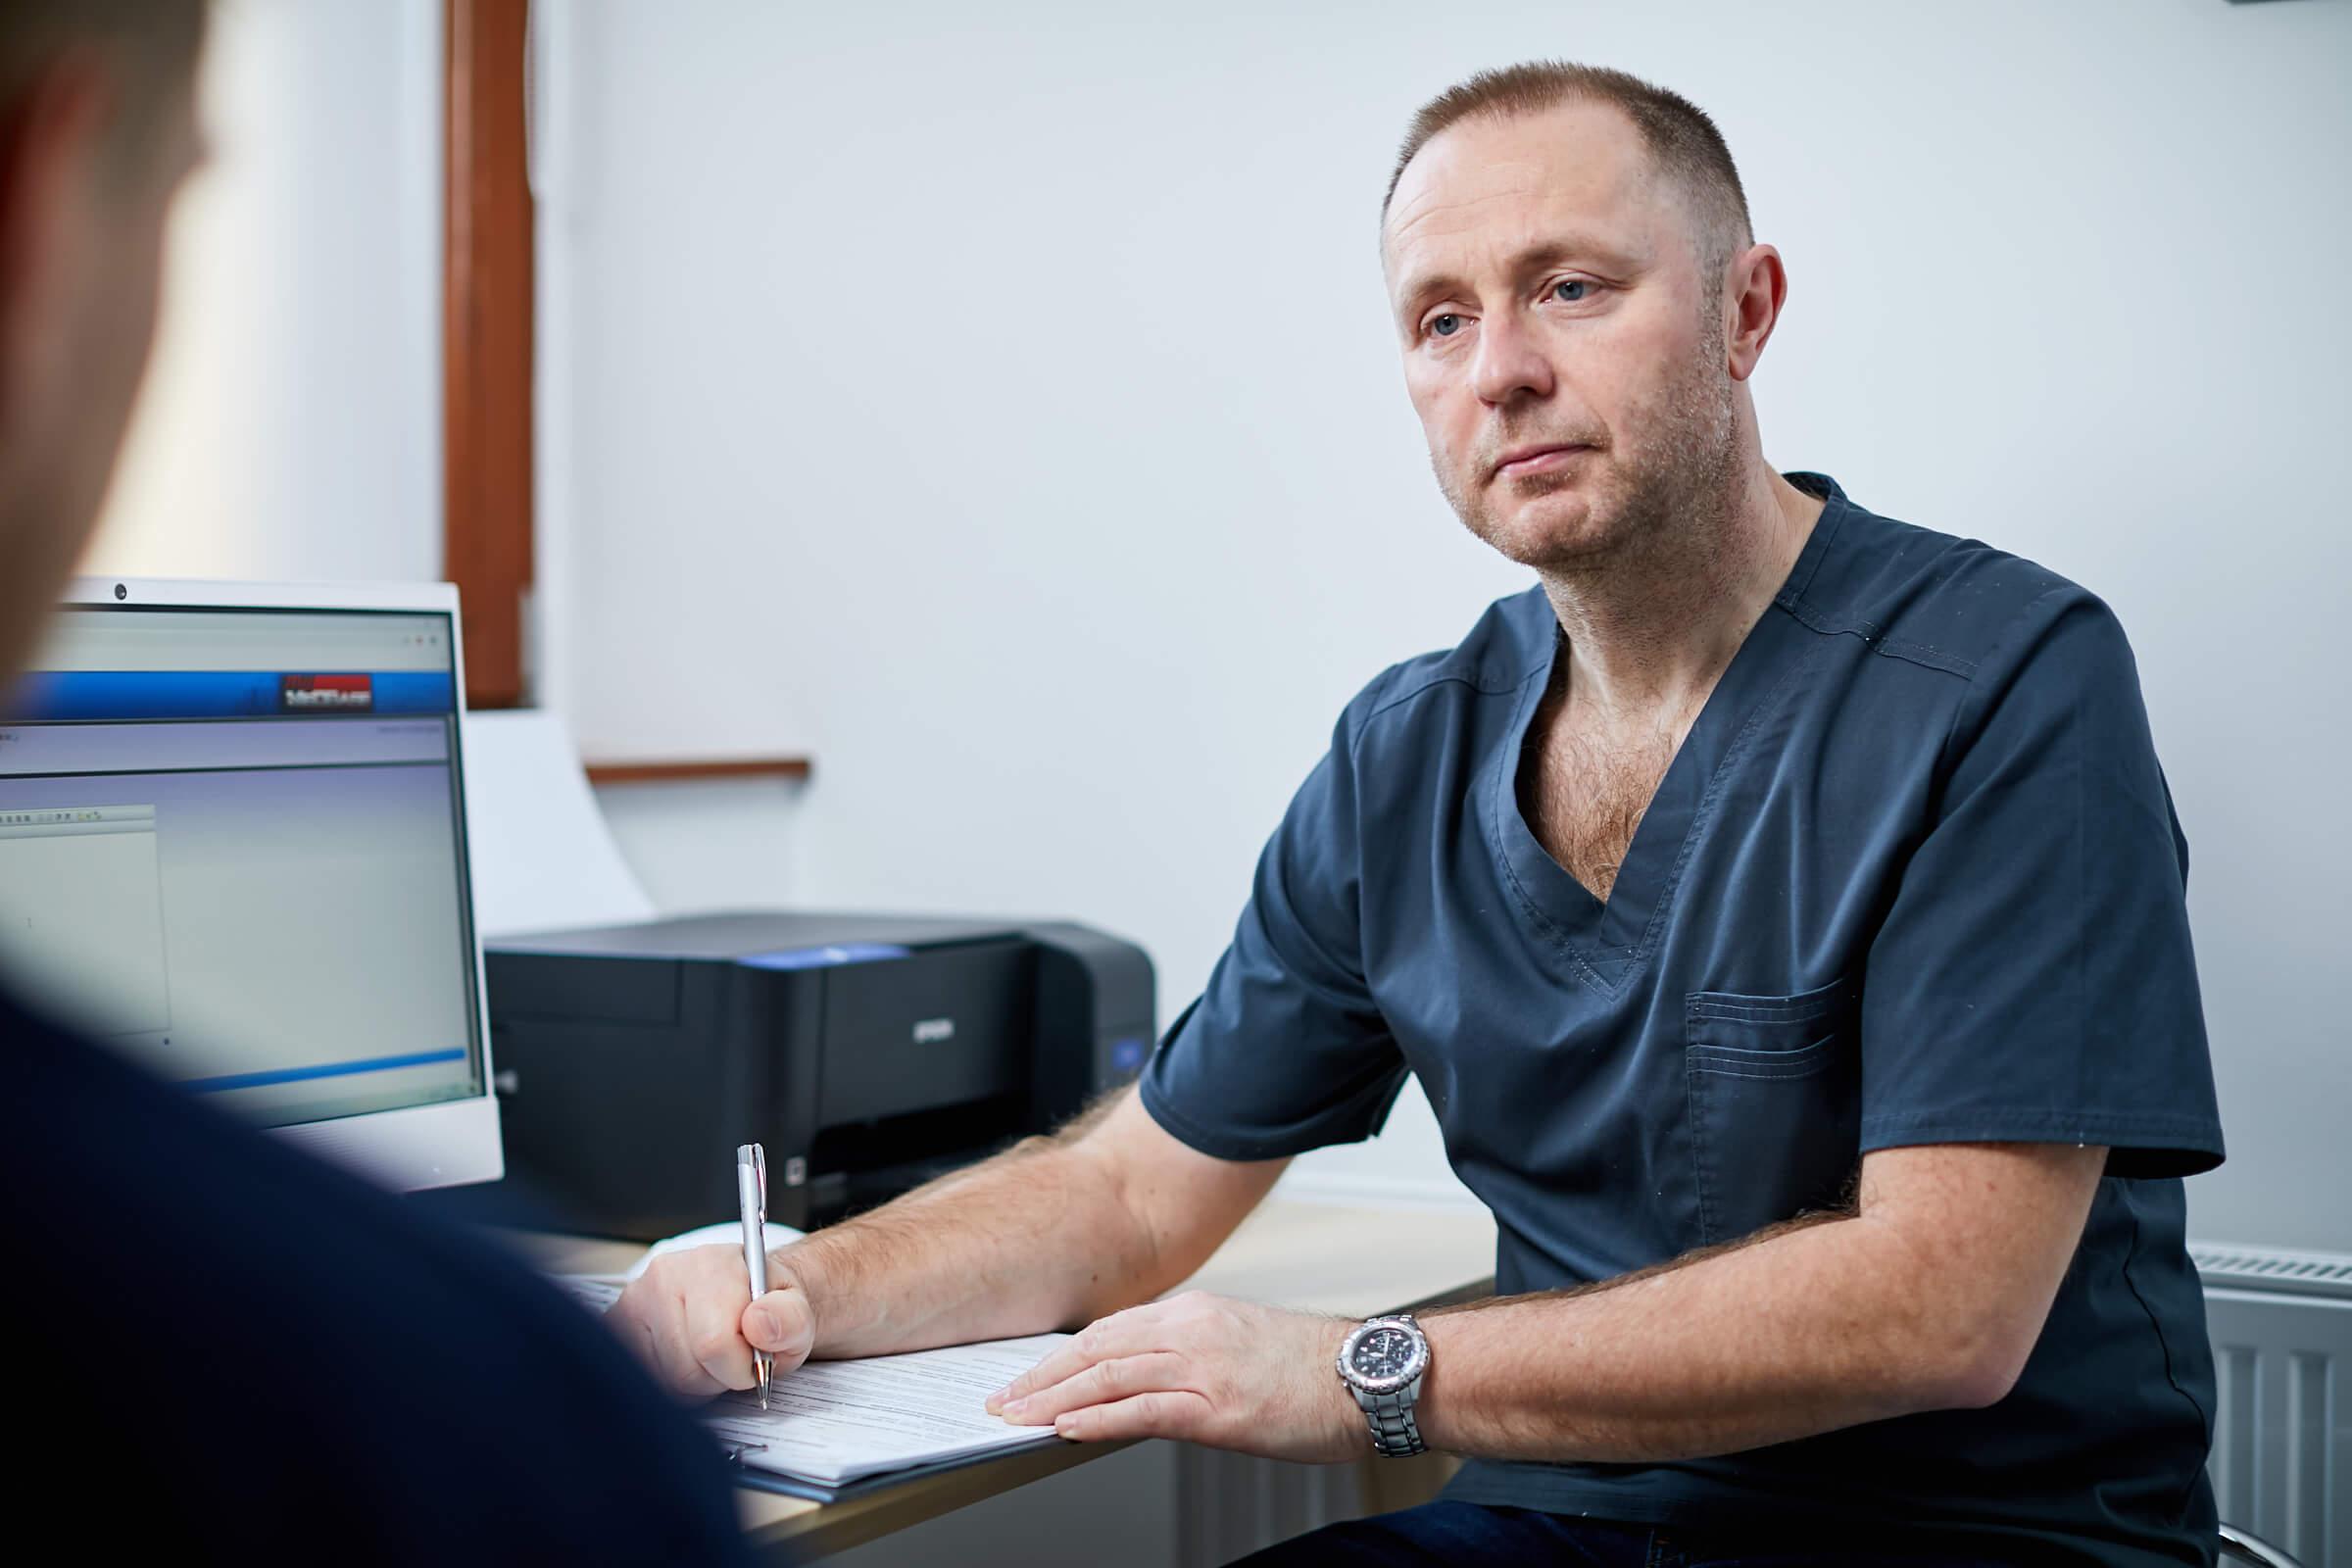 Dr. Trautmann Tibor urol�gia mag�nrendel�s k�zben.